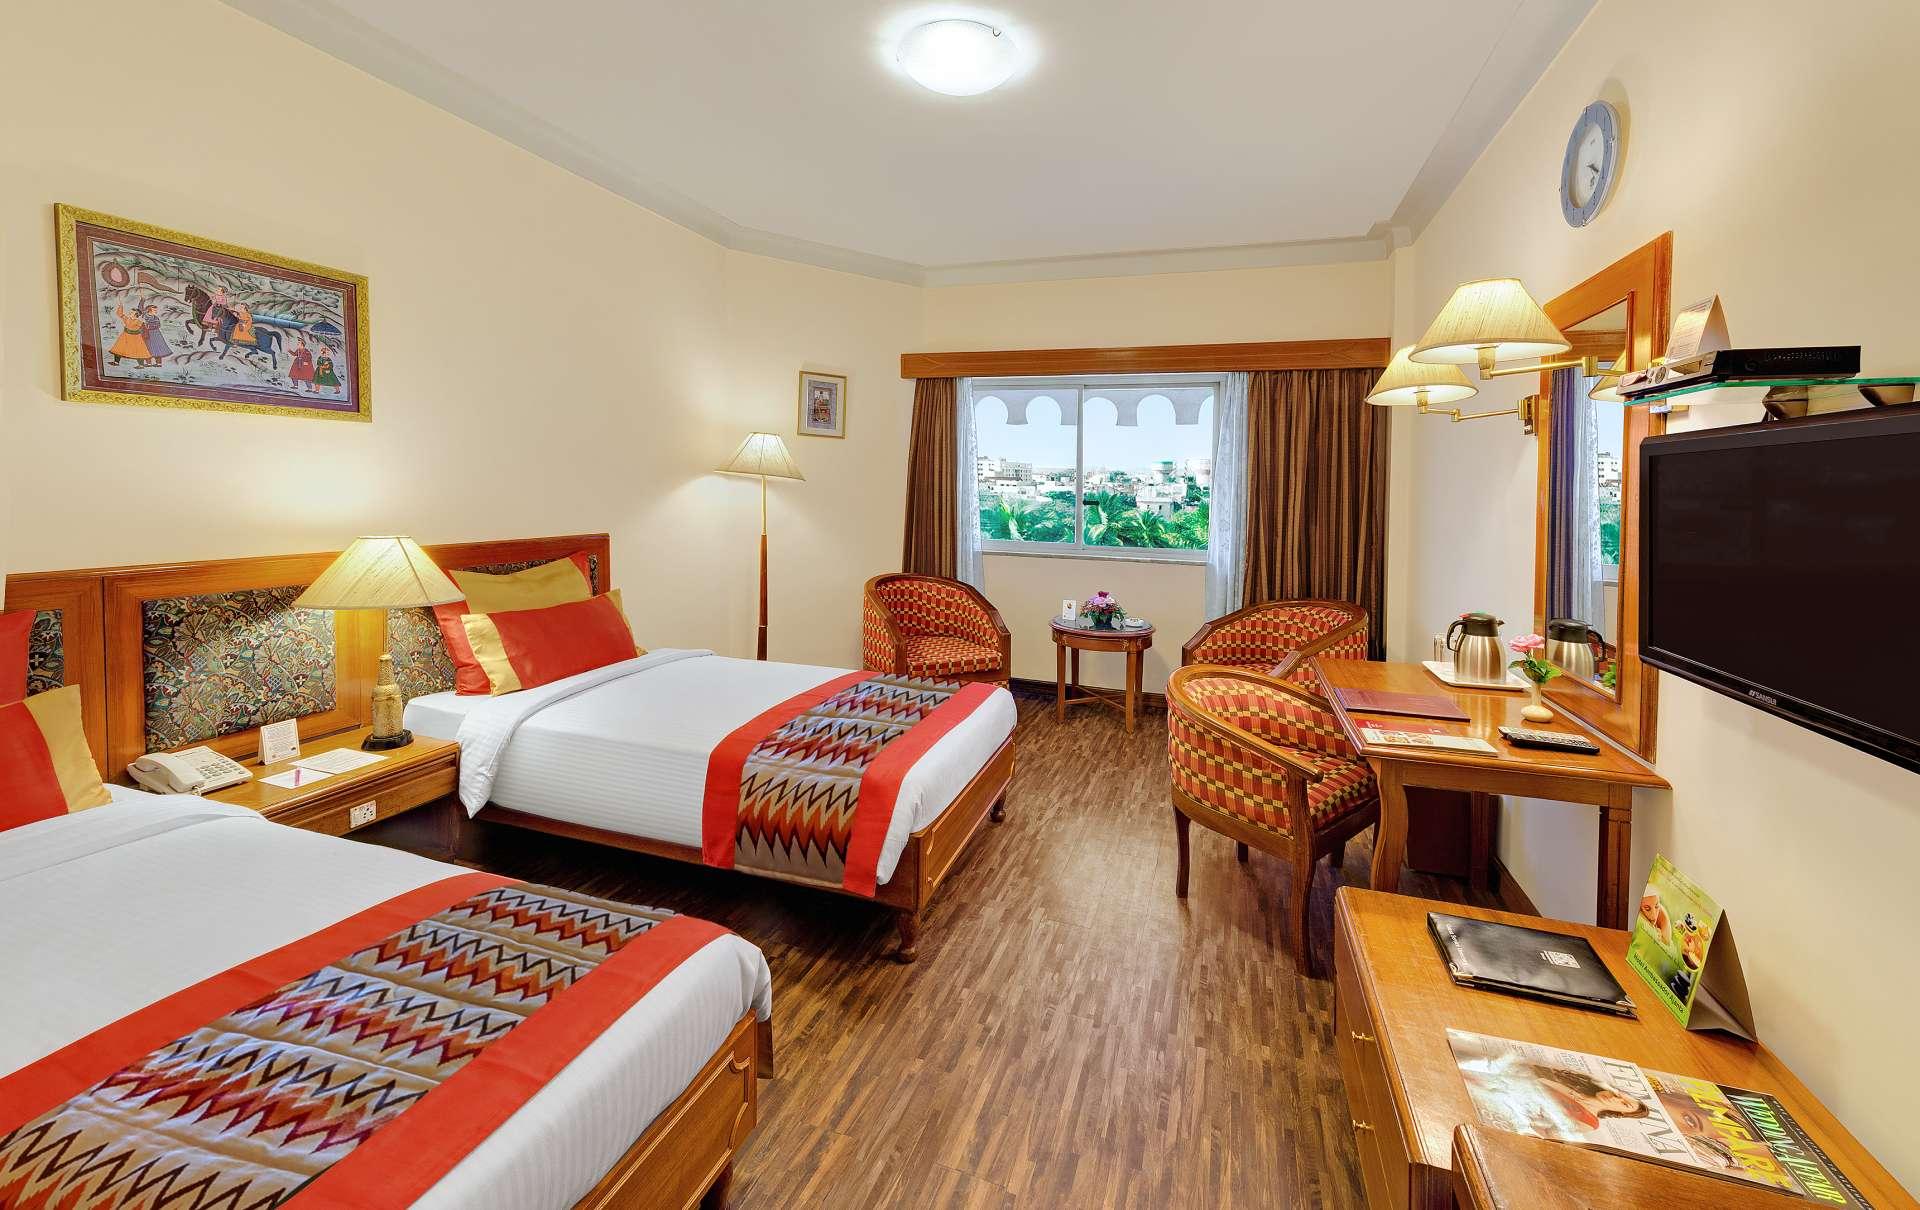 deluxe room 1 ambassador ajanta aurangabad - The Ambassador | Heritage Hotels in Mumbai, Aurangabad, Chennai - Ambassador Ajanta Aurangabad